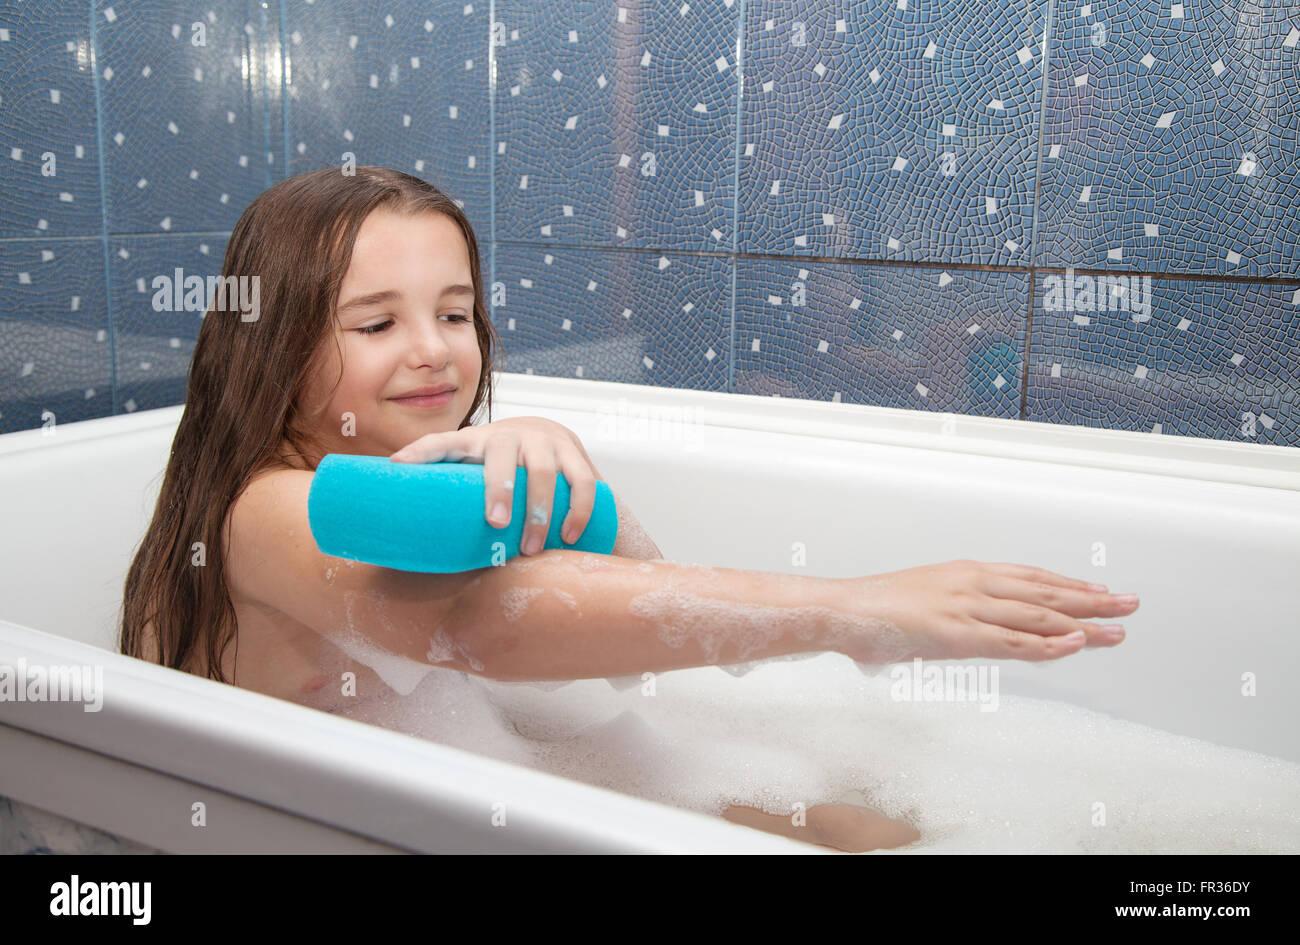 Nood girls in the bath tub ICLOUD LEAK massage pics photos